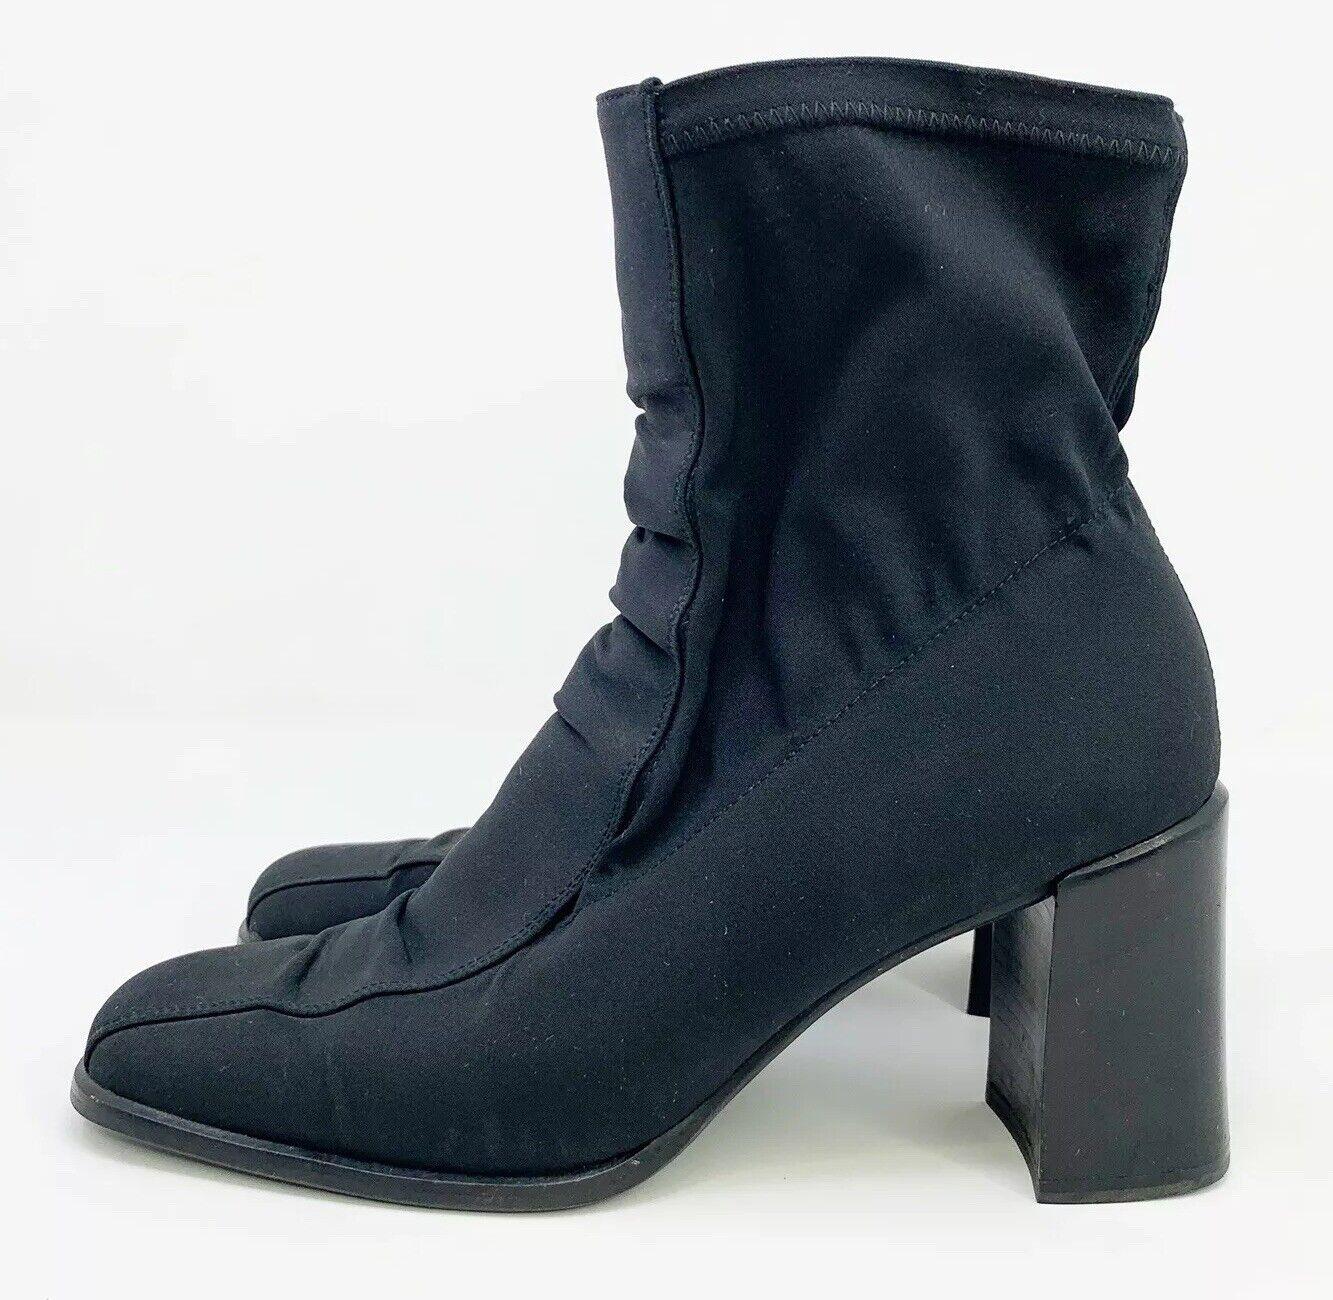 Women's Paul Green Munchen Nylon Heel Boots Elastic Ankle Sz US 8.5 UK 5.5